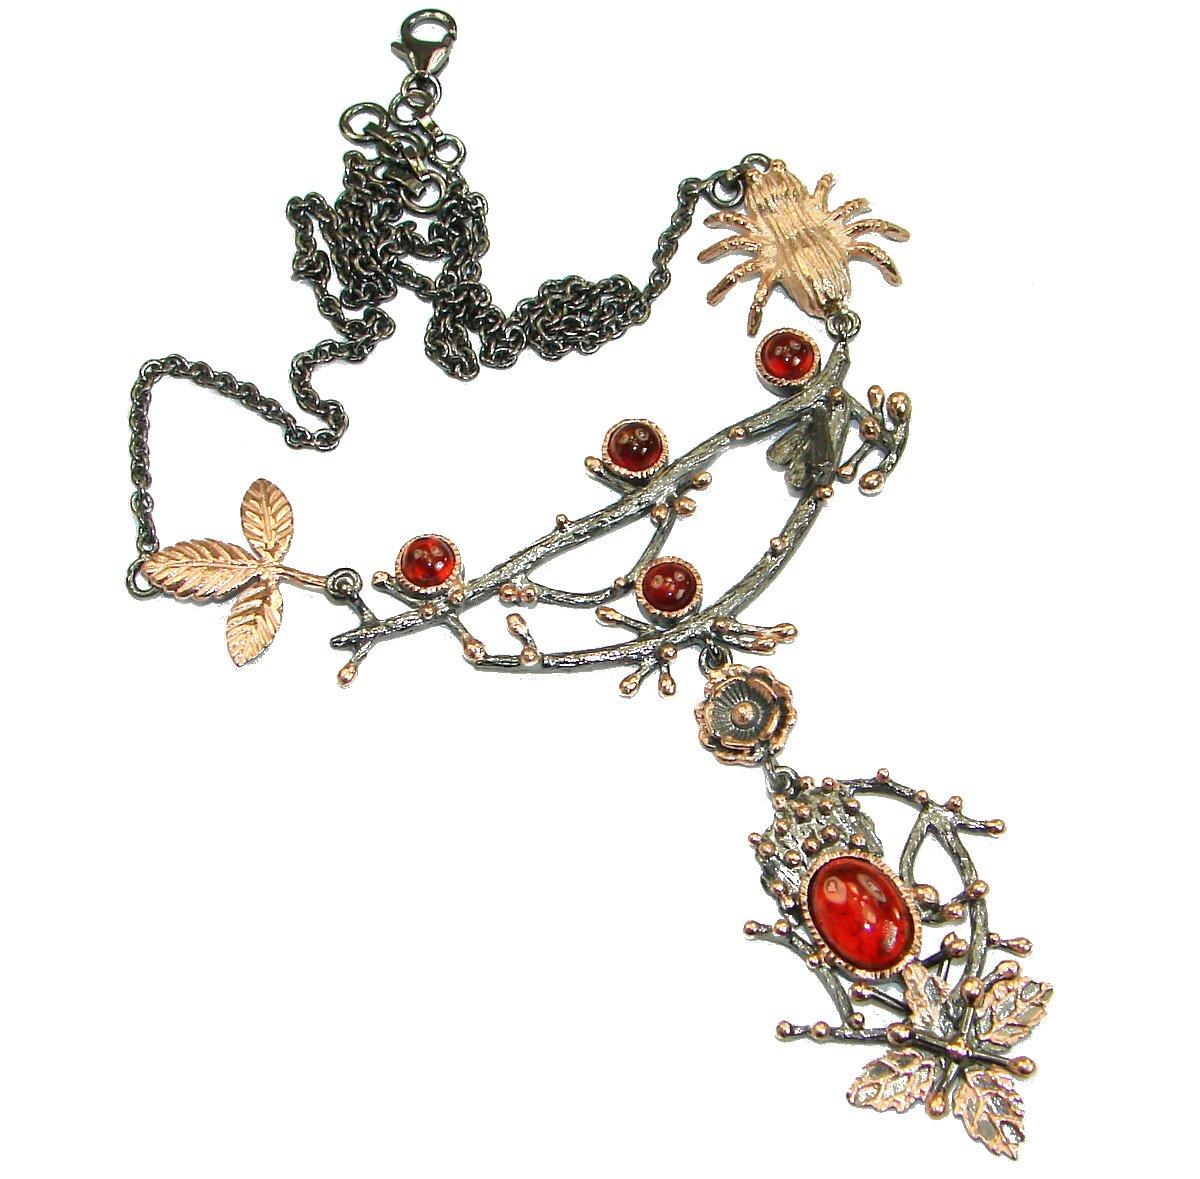 Garnet Women 925 Sterling Silver Necklace - FREE GIFT BOX